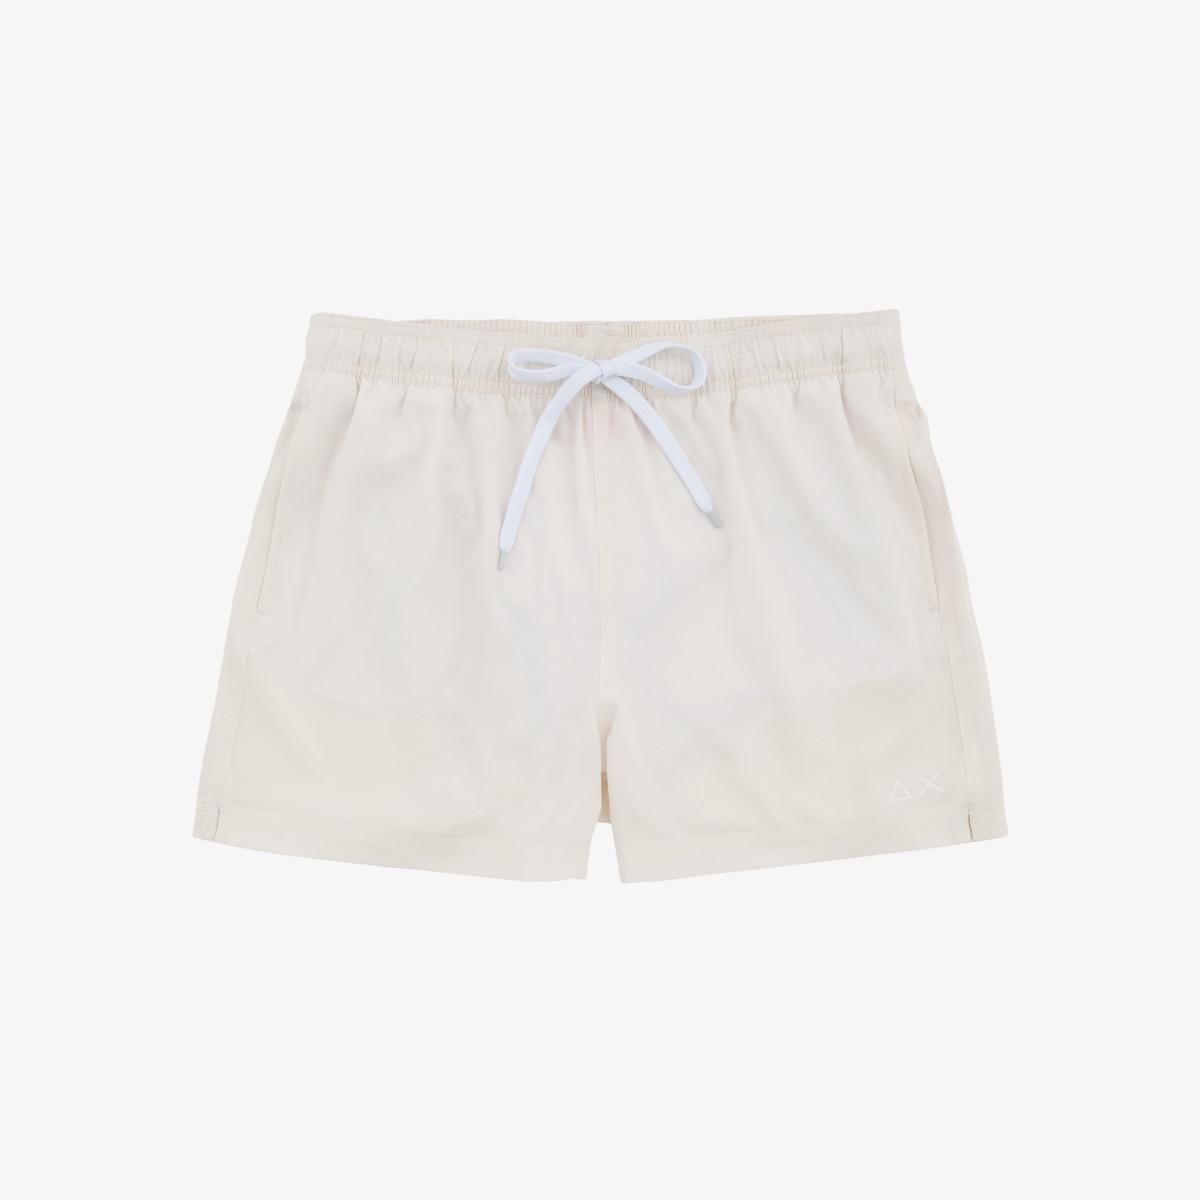 SWIM PANT SOLID OFF WHITE